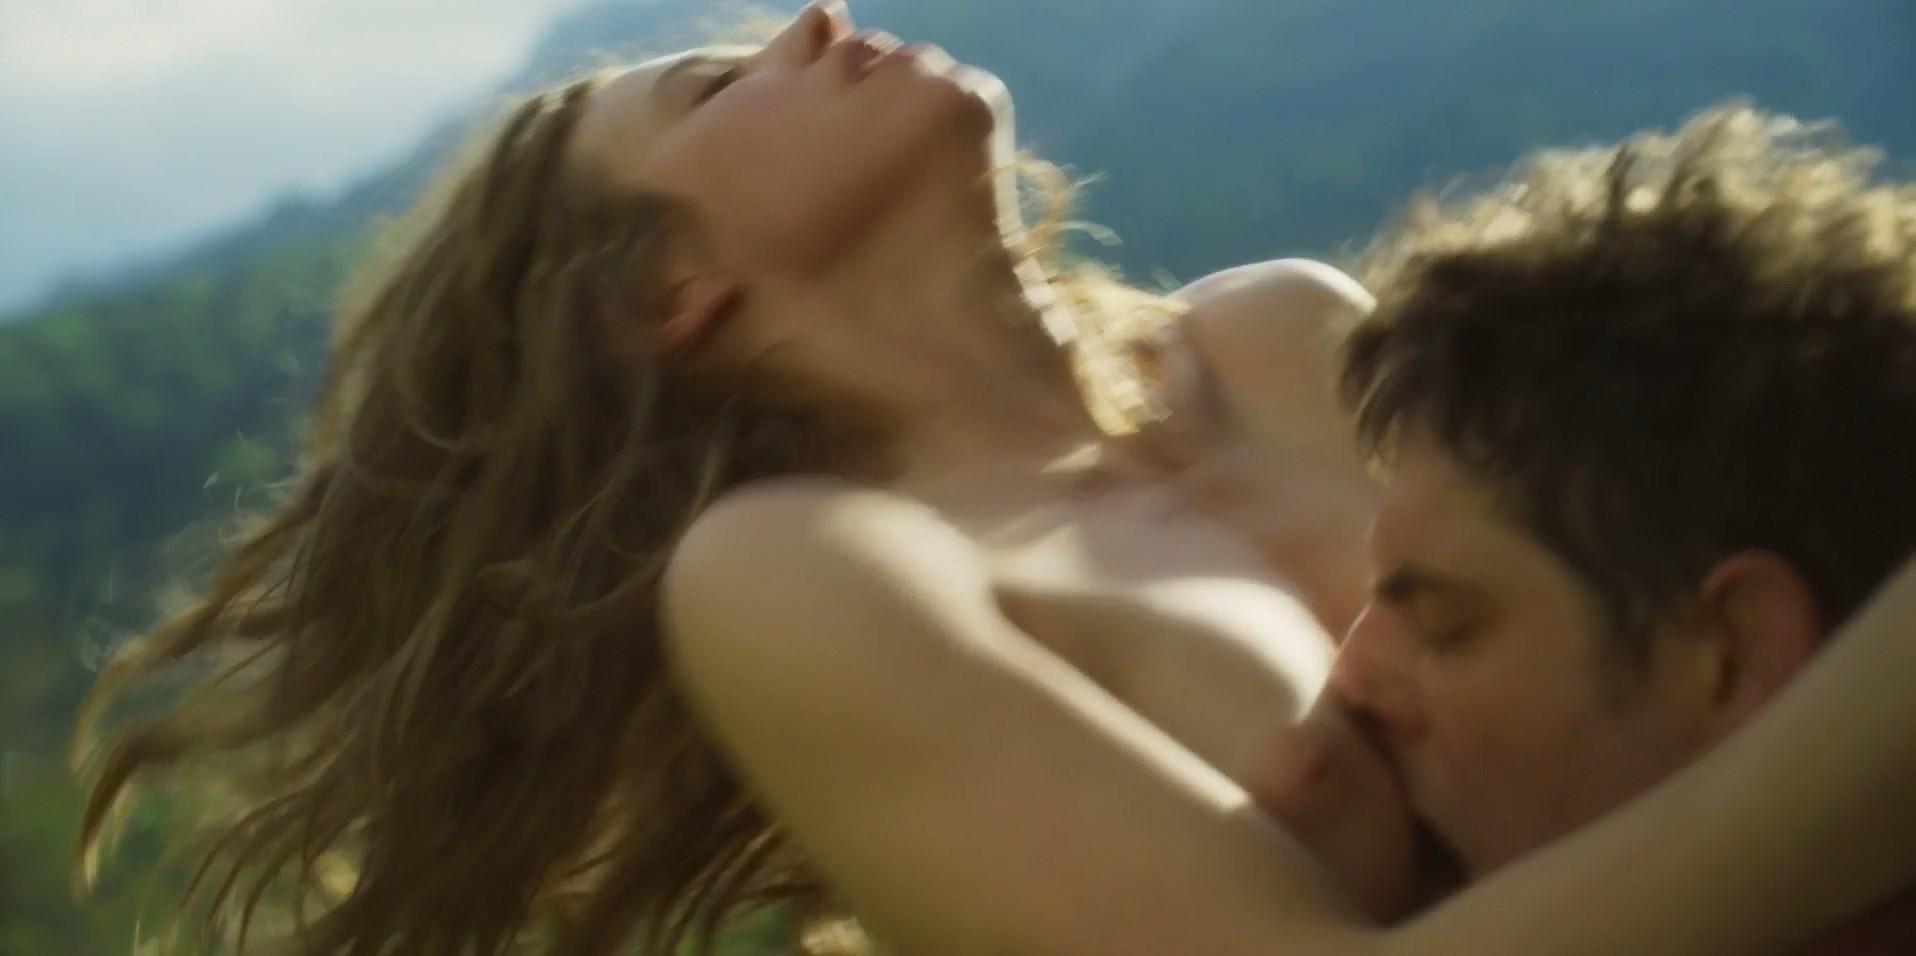 Lou de Laage nude - Blanche comme neige (2019)